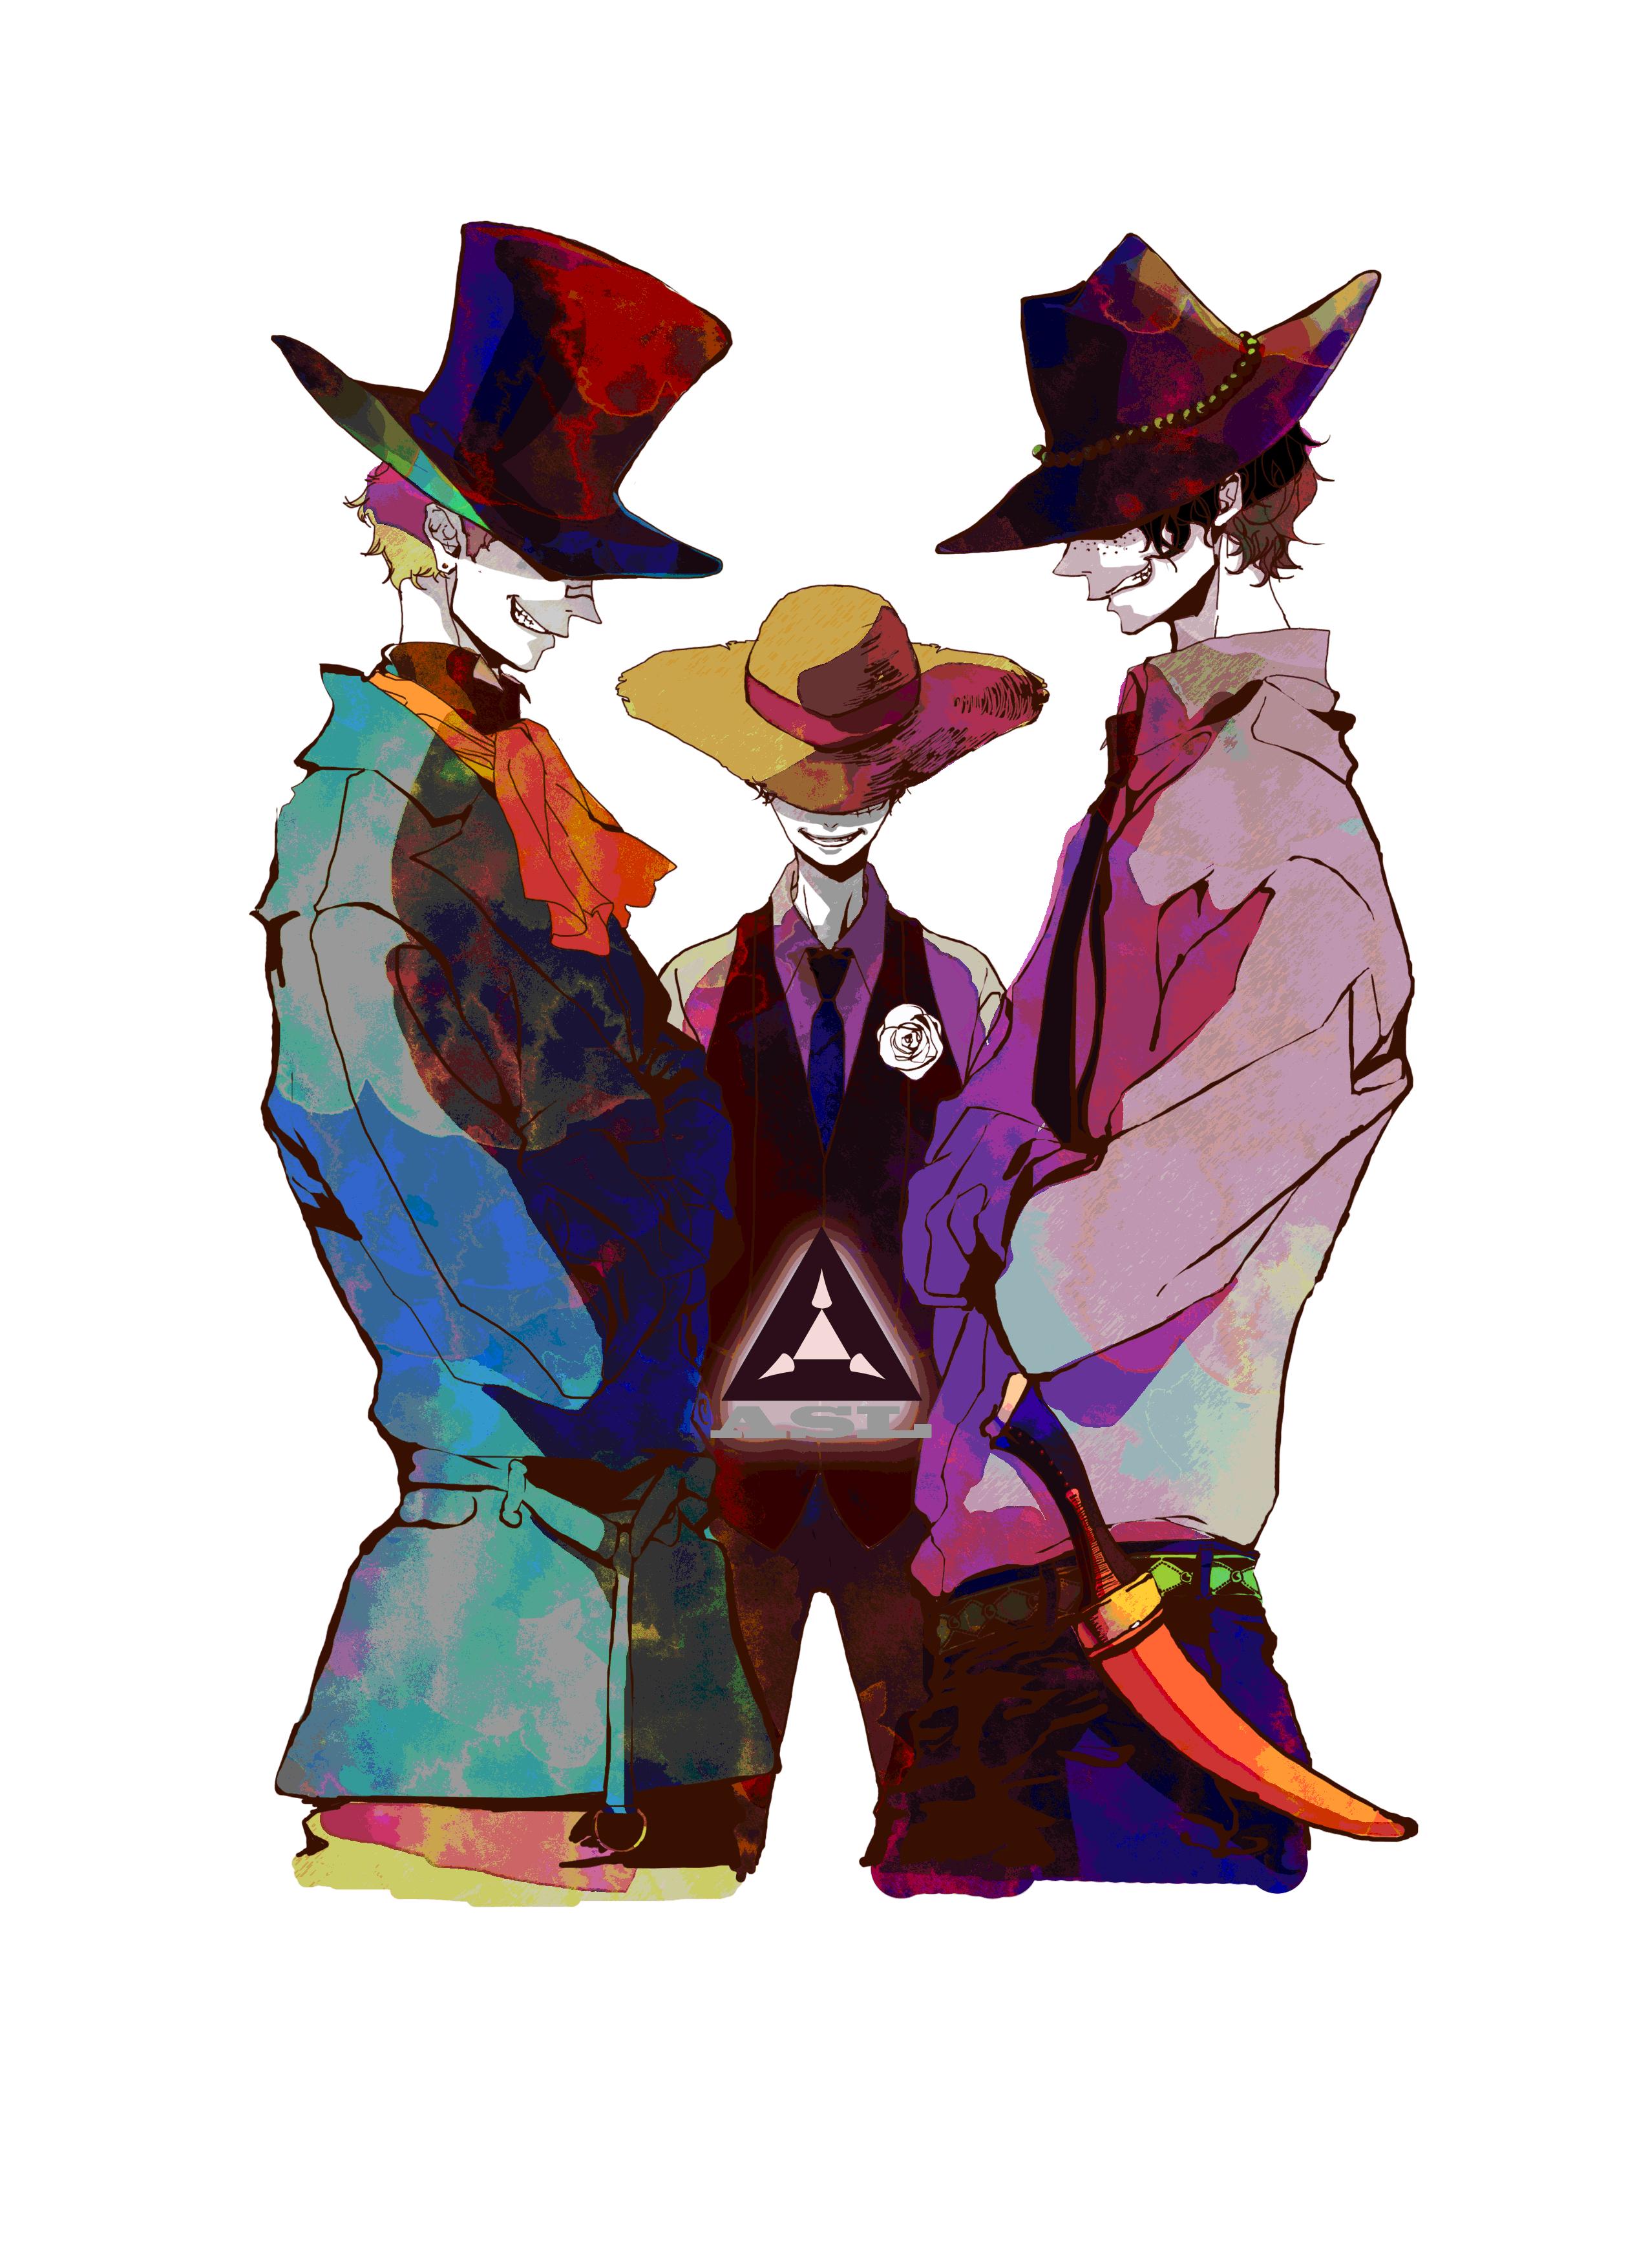 Asl One Piece Mobile Wallpaper 1712354 Zerochan Anime Image Board